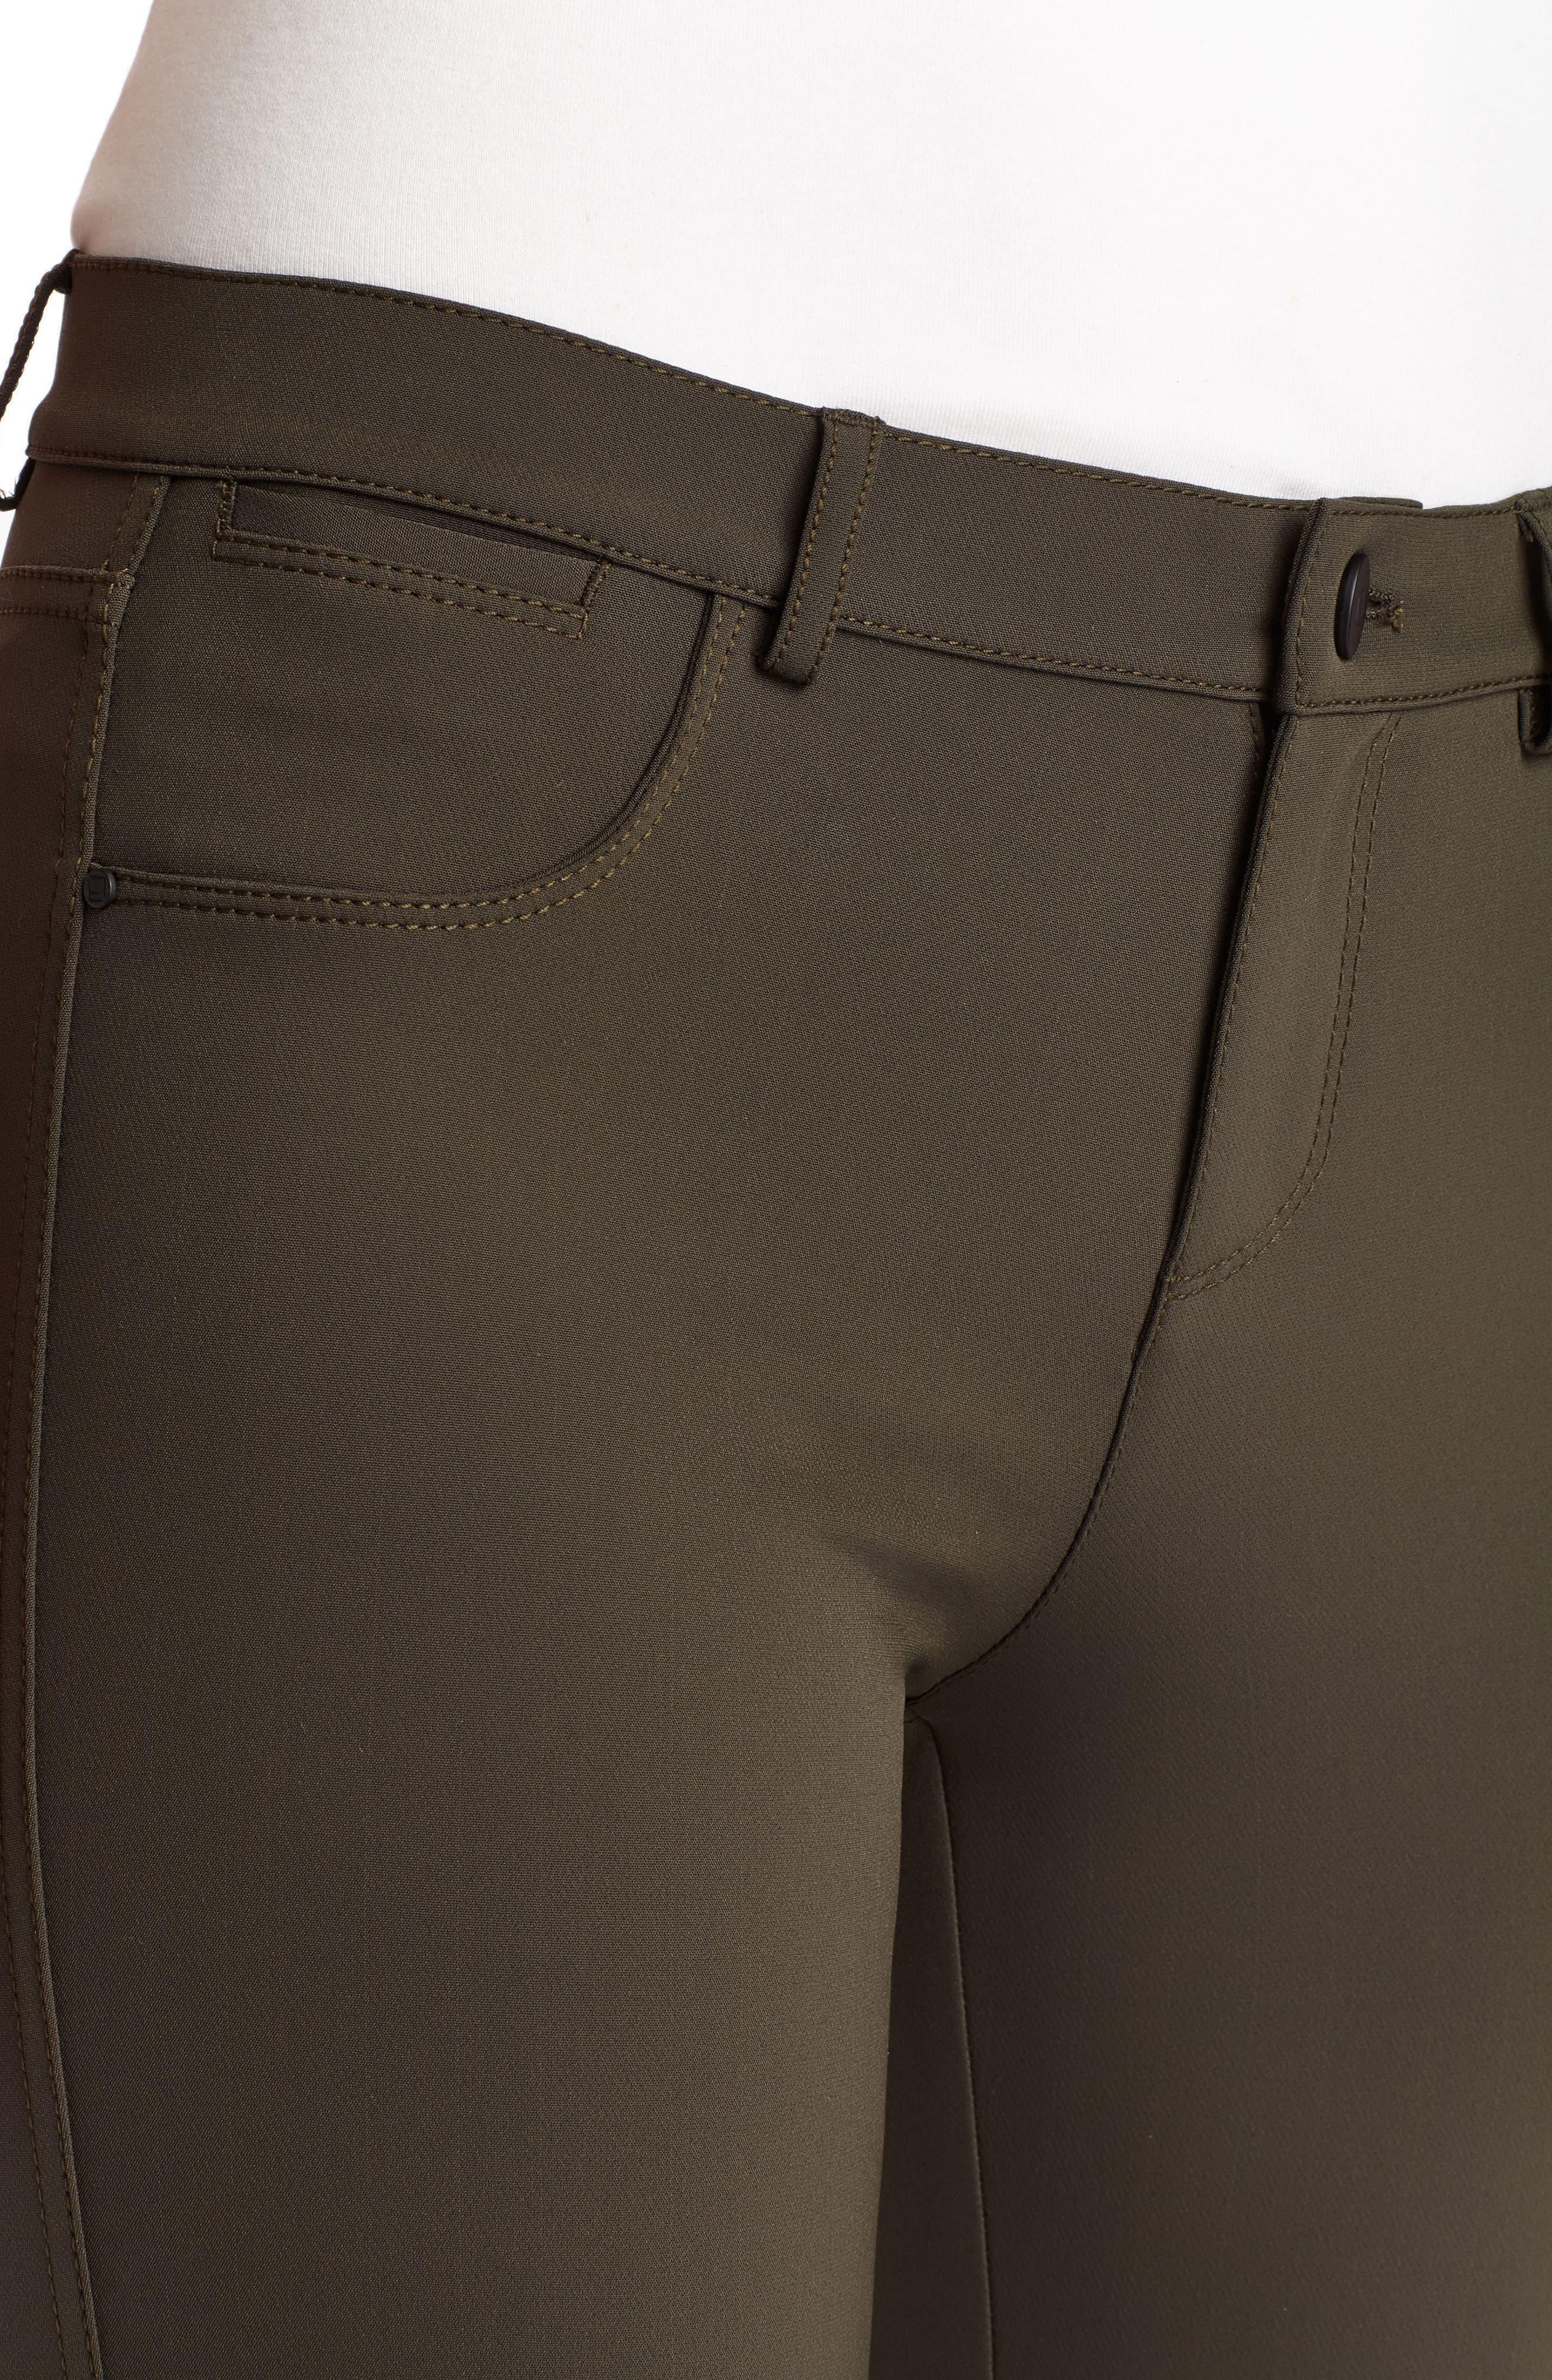 Alternate Image 3  - Lafayette 148 New York Mercer Acclaimed Stretch Skinny Pants